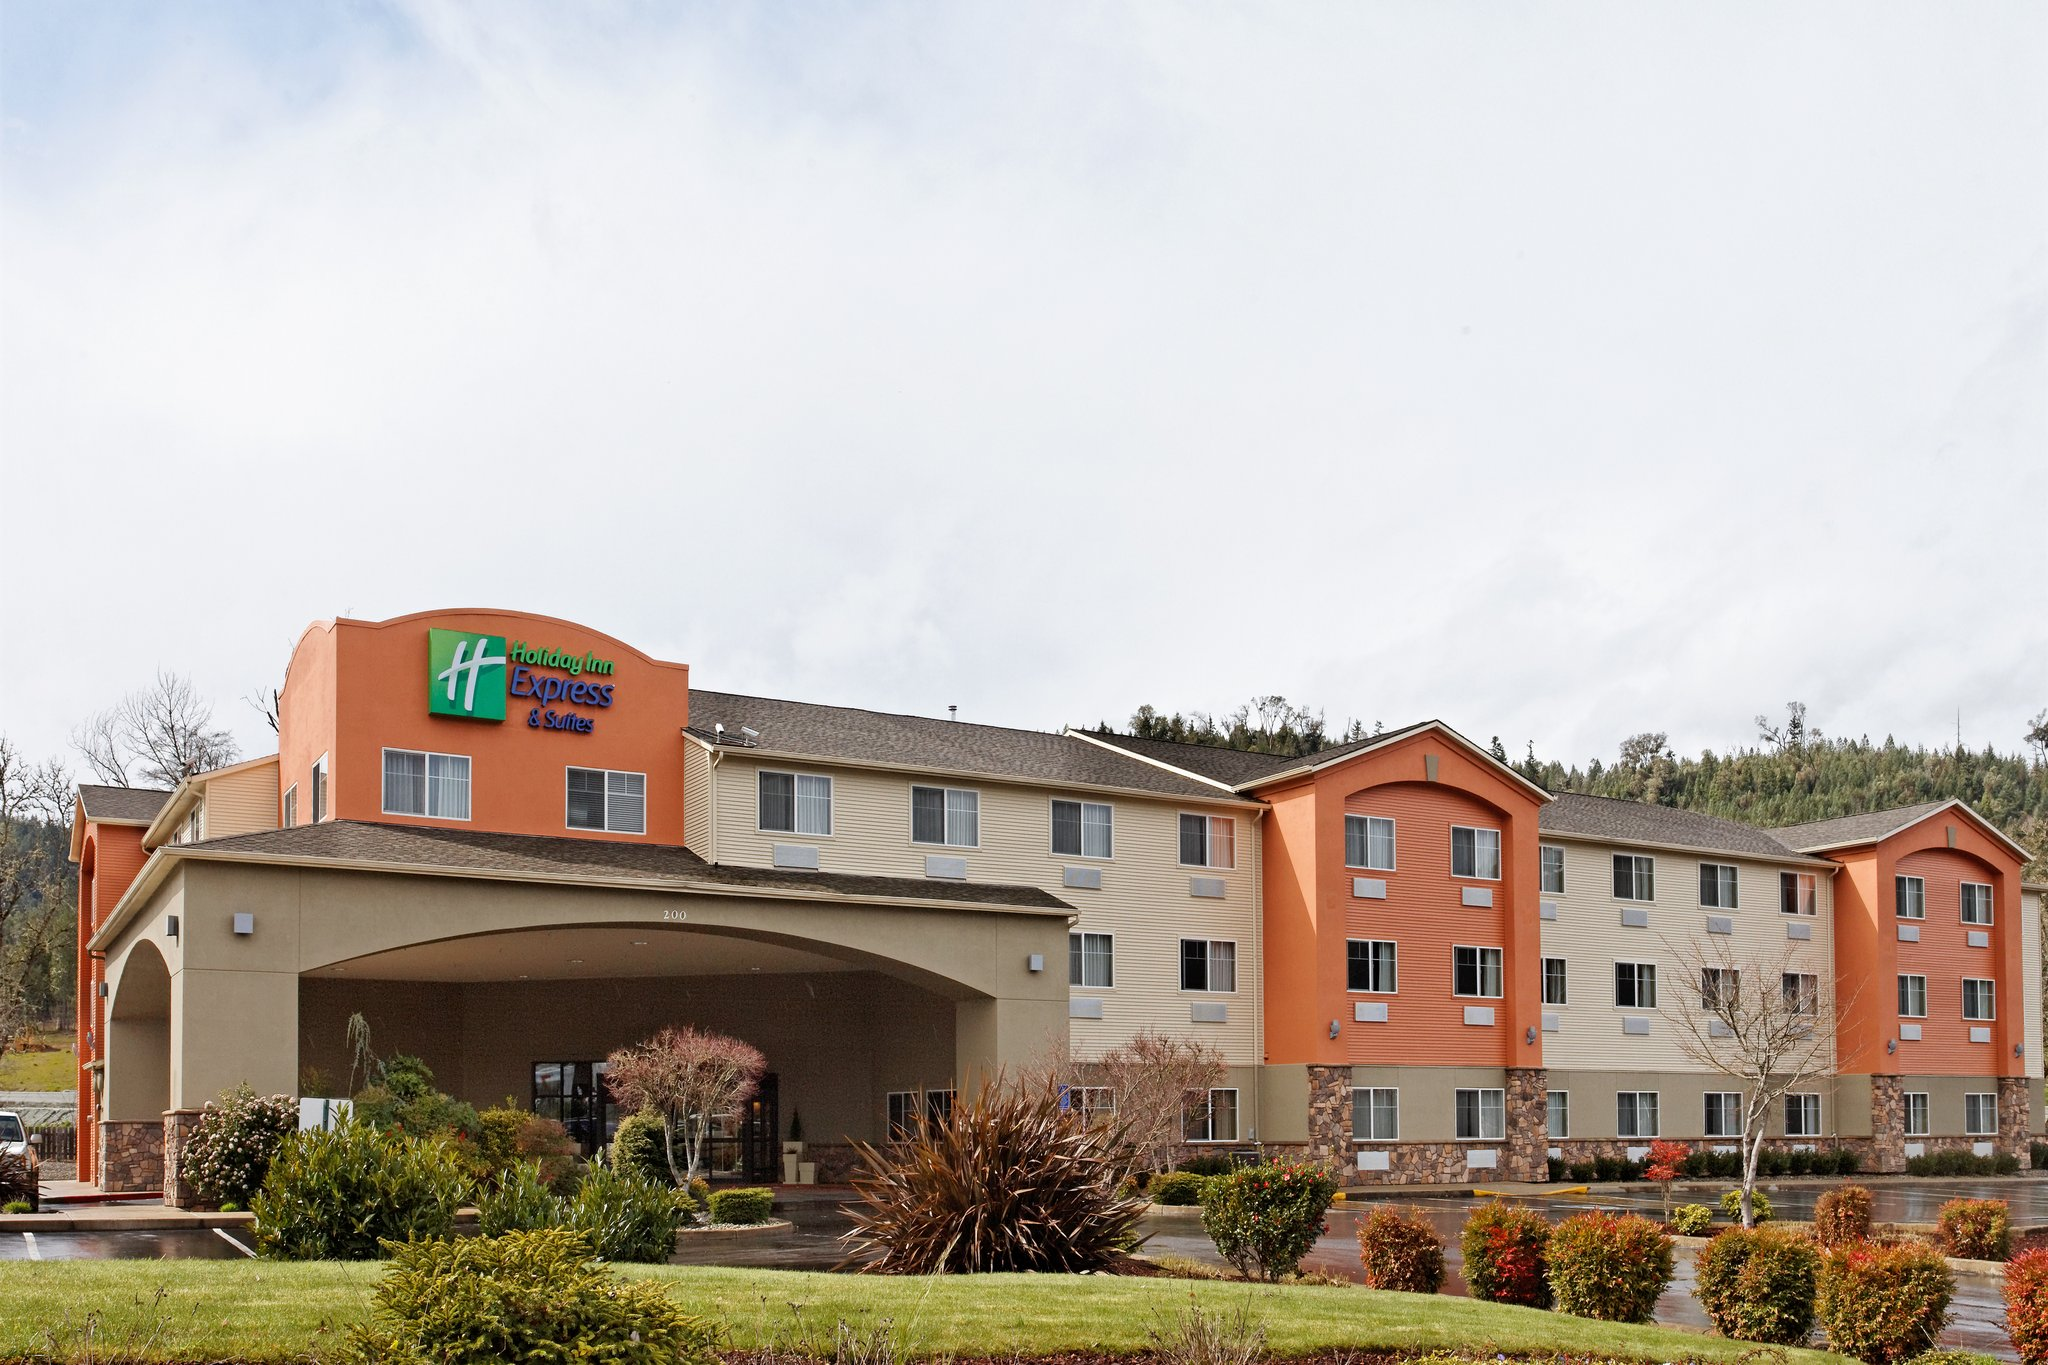 Holiday Inn Express Canyonville